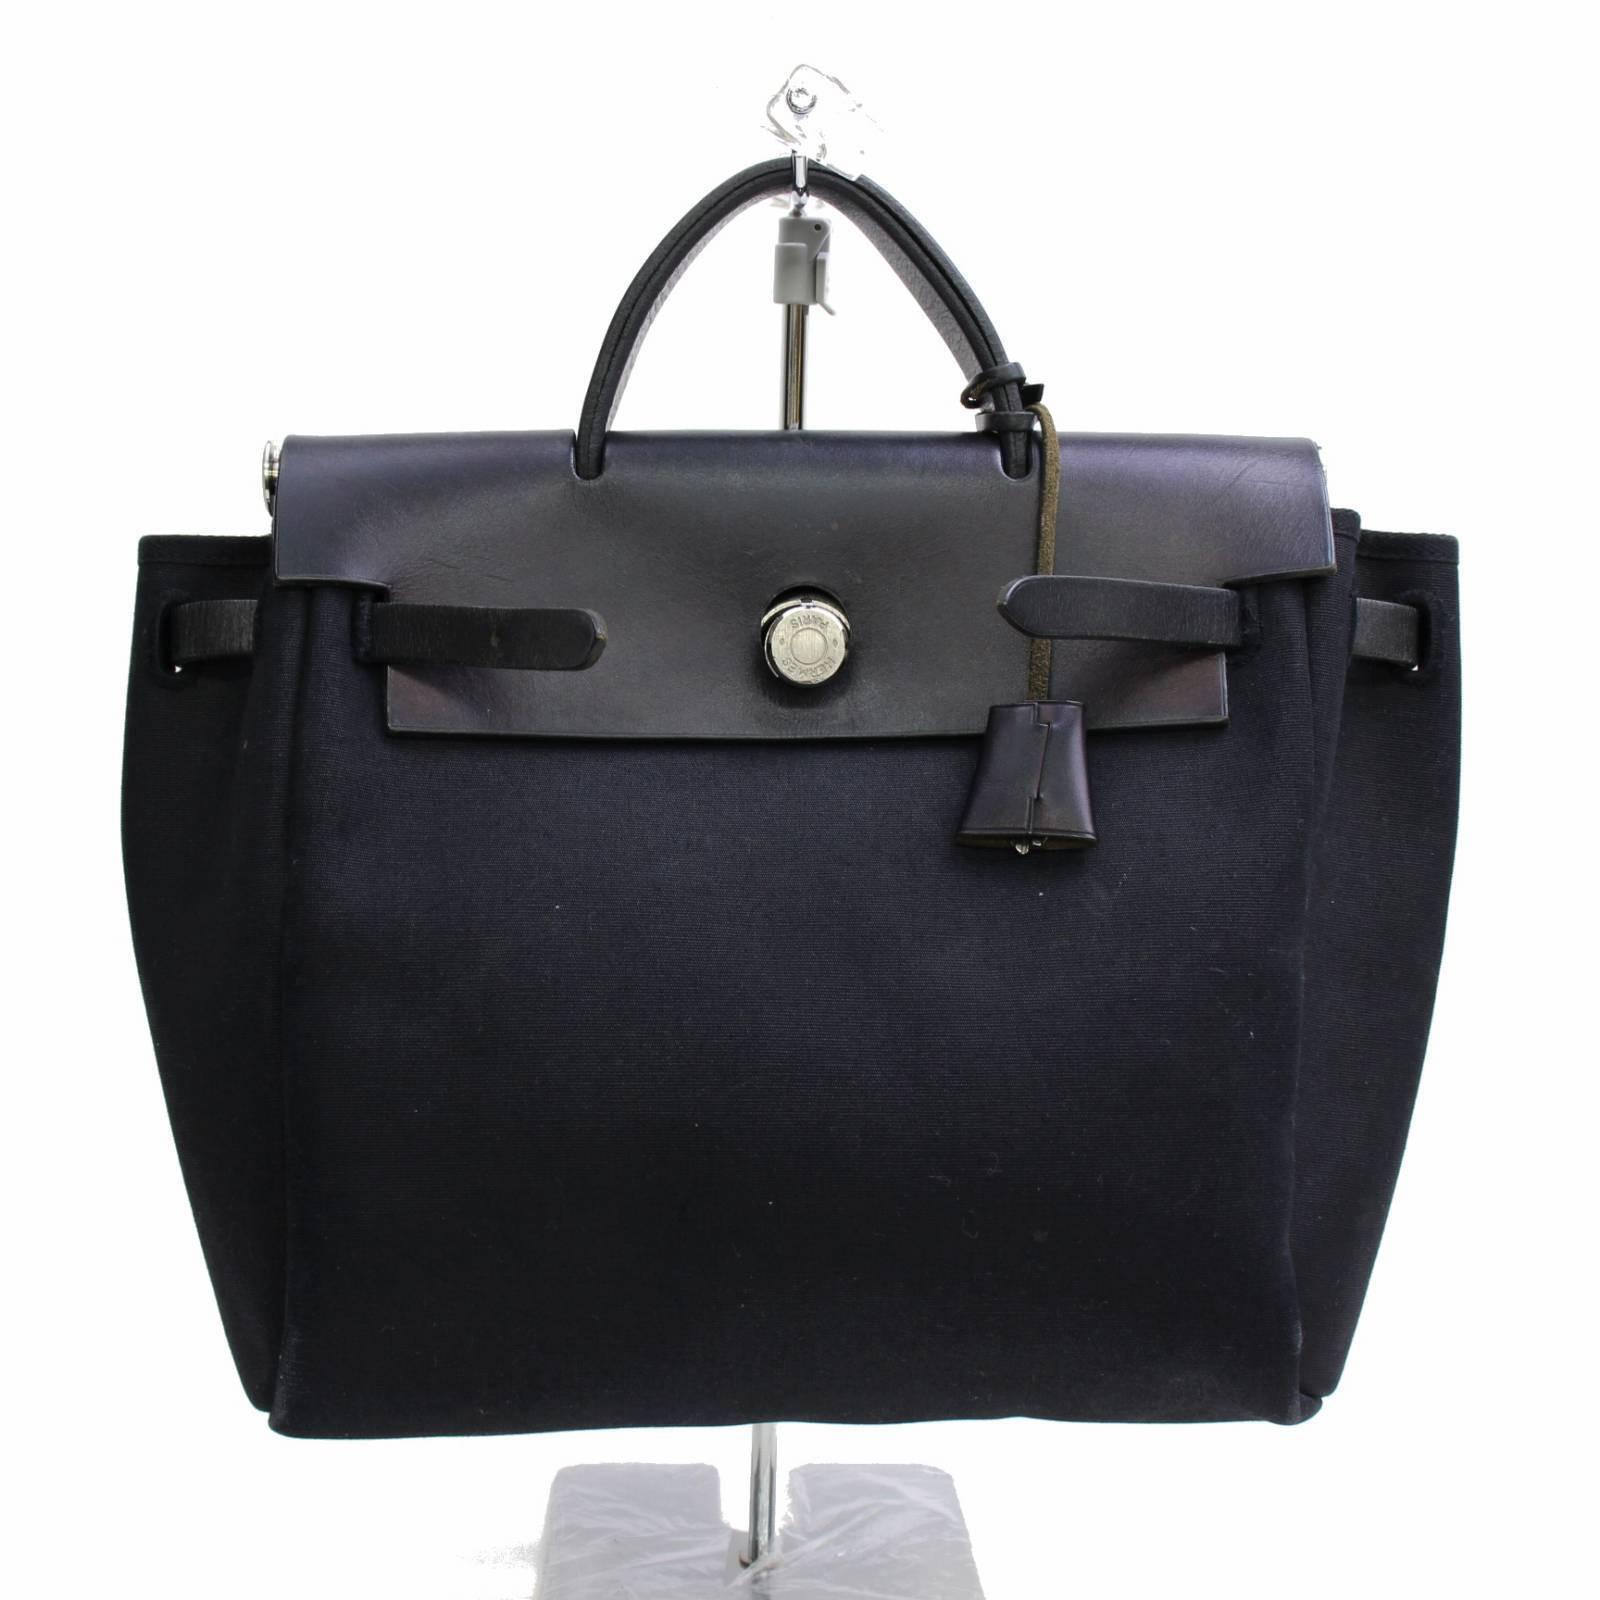 54d8a93da50b Details about Hermes Paris Womens Black Canvas Leather Herbag Purse Handbag  73014-B